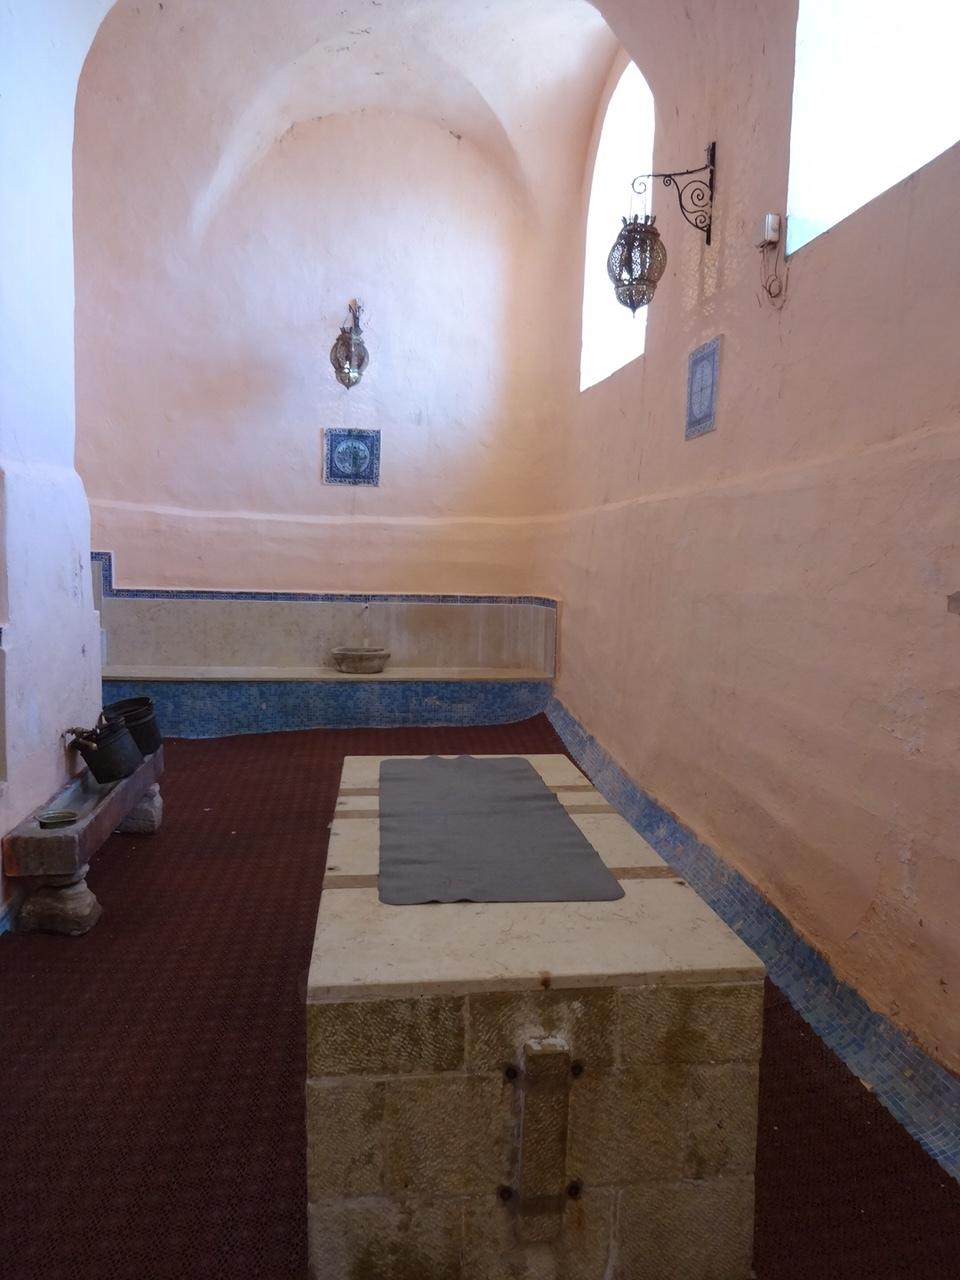 Steam bath in the Hamam